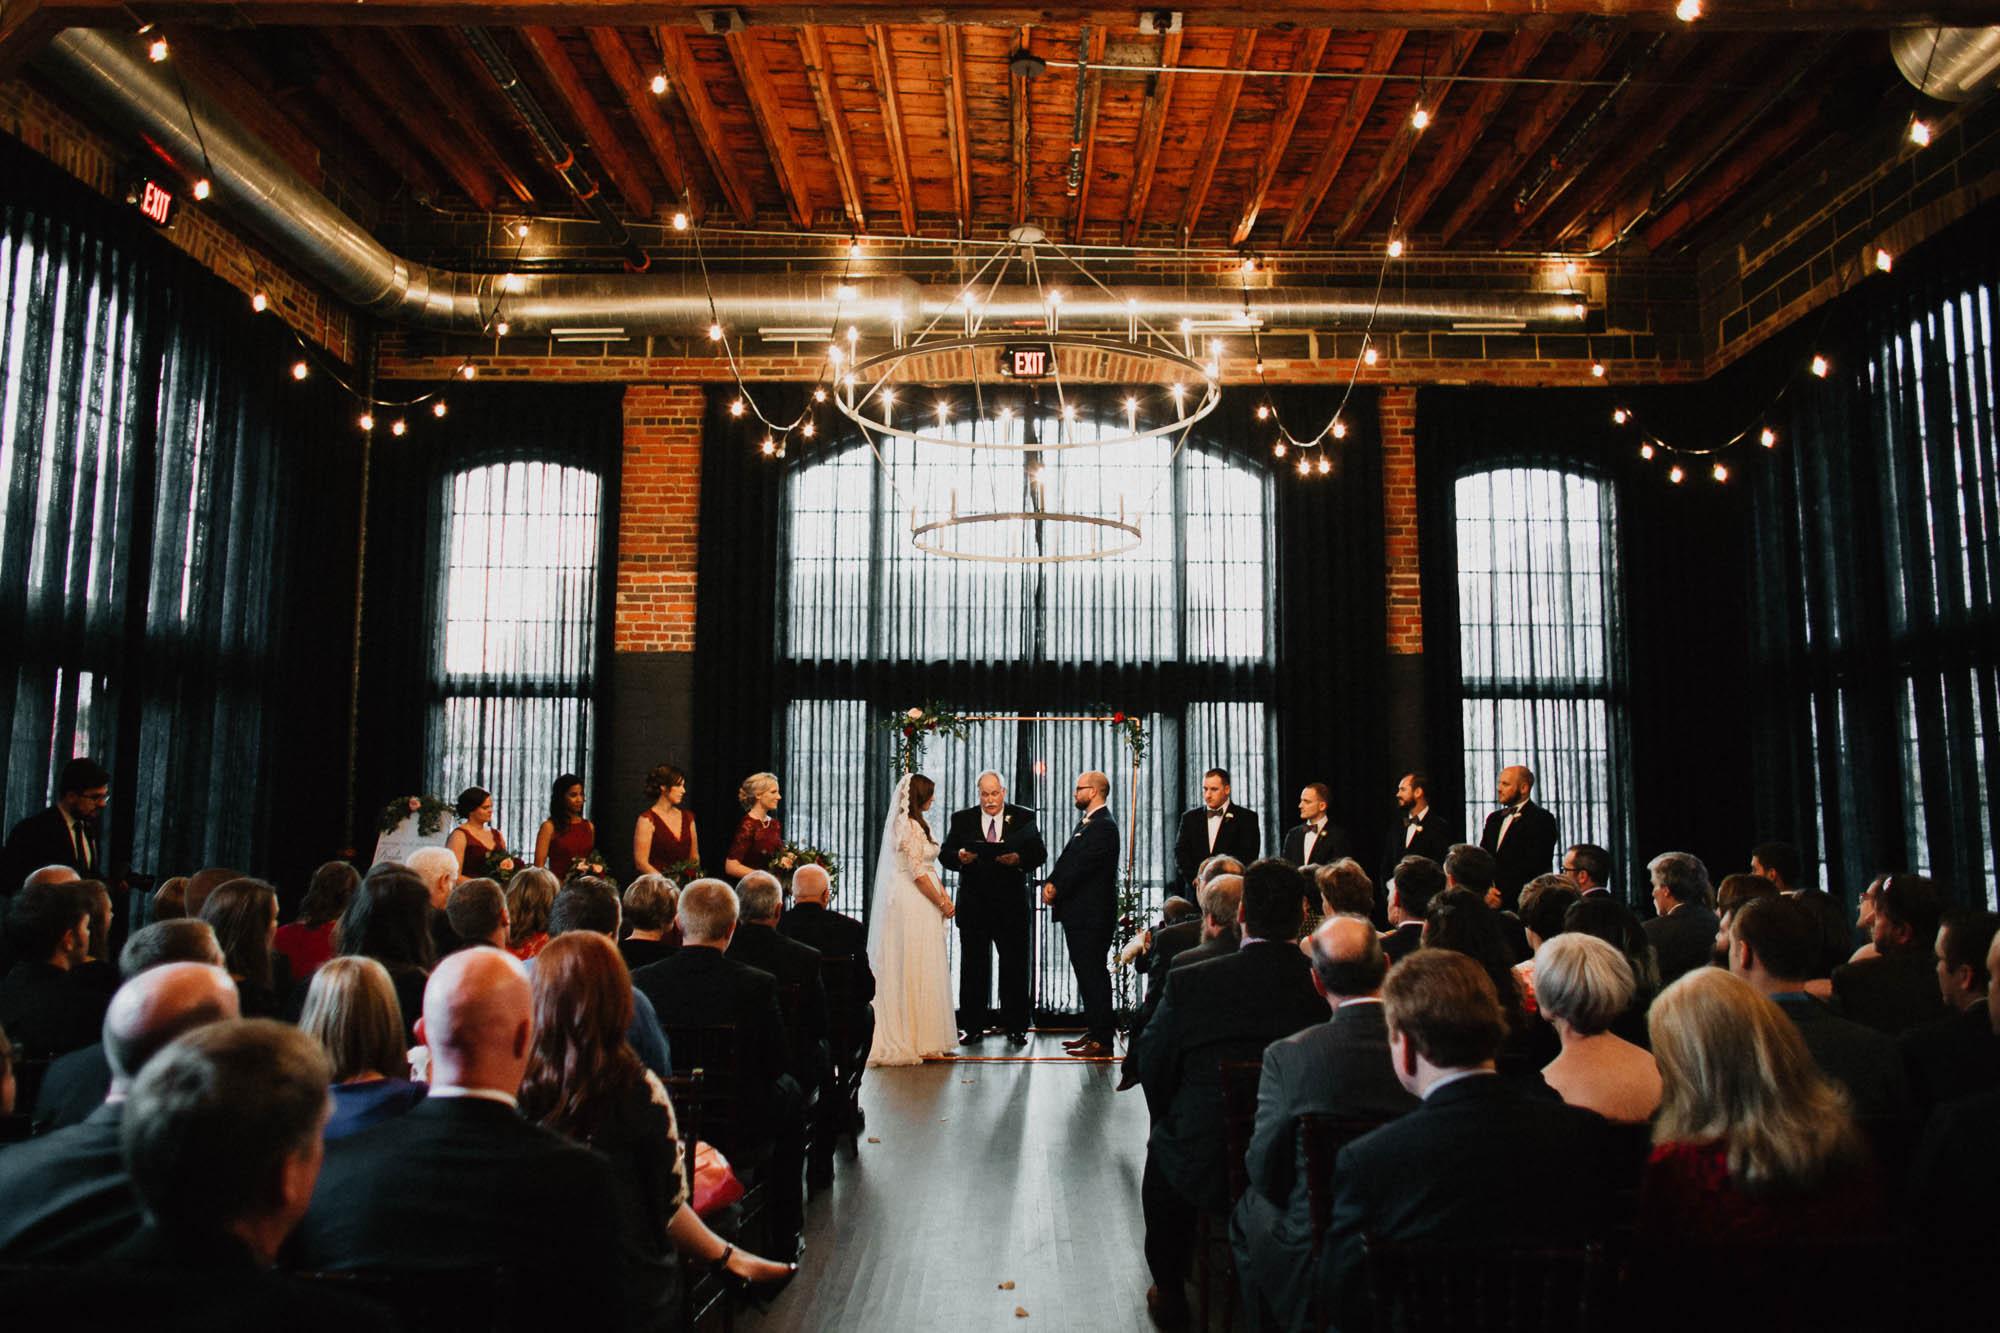 Highline-Car-House-Wedding-Columbus-Kristin-Aaron-074.jpg